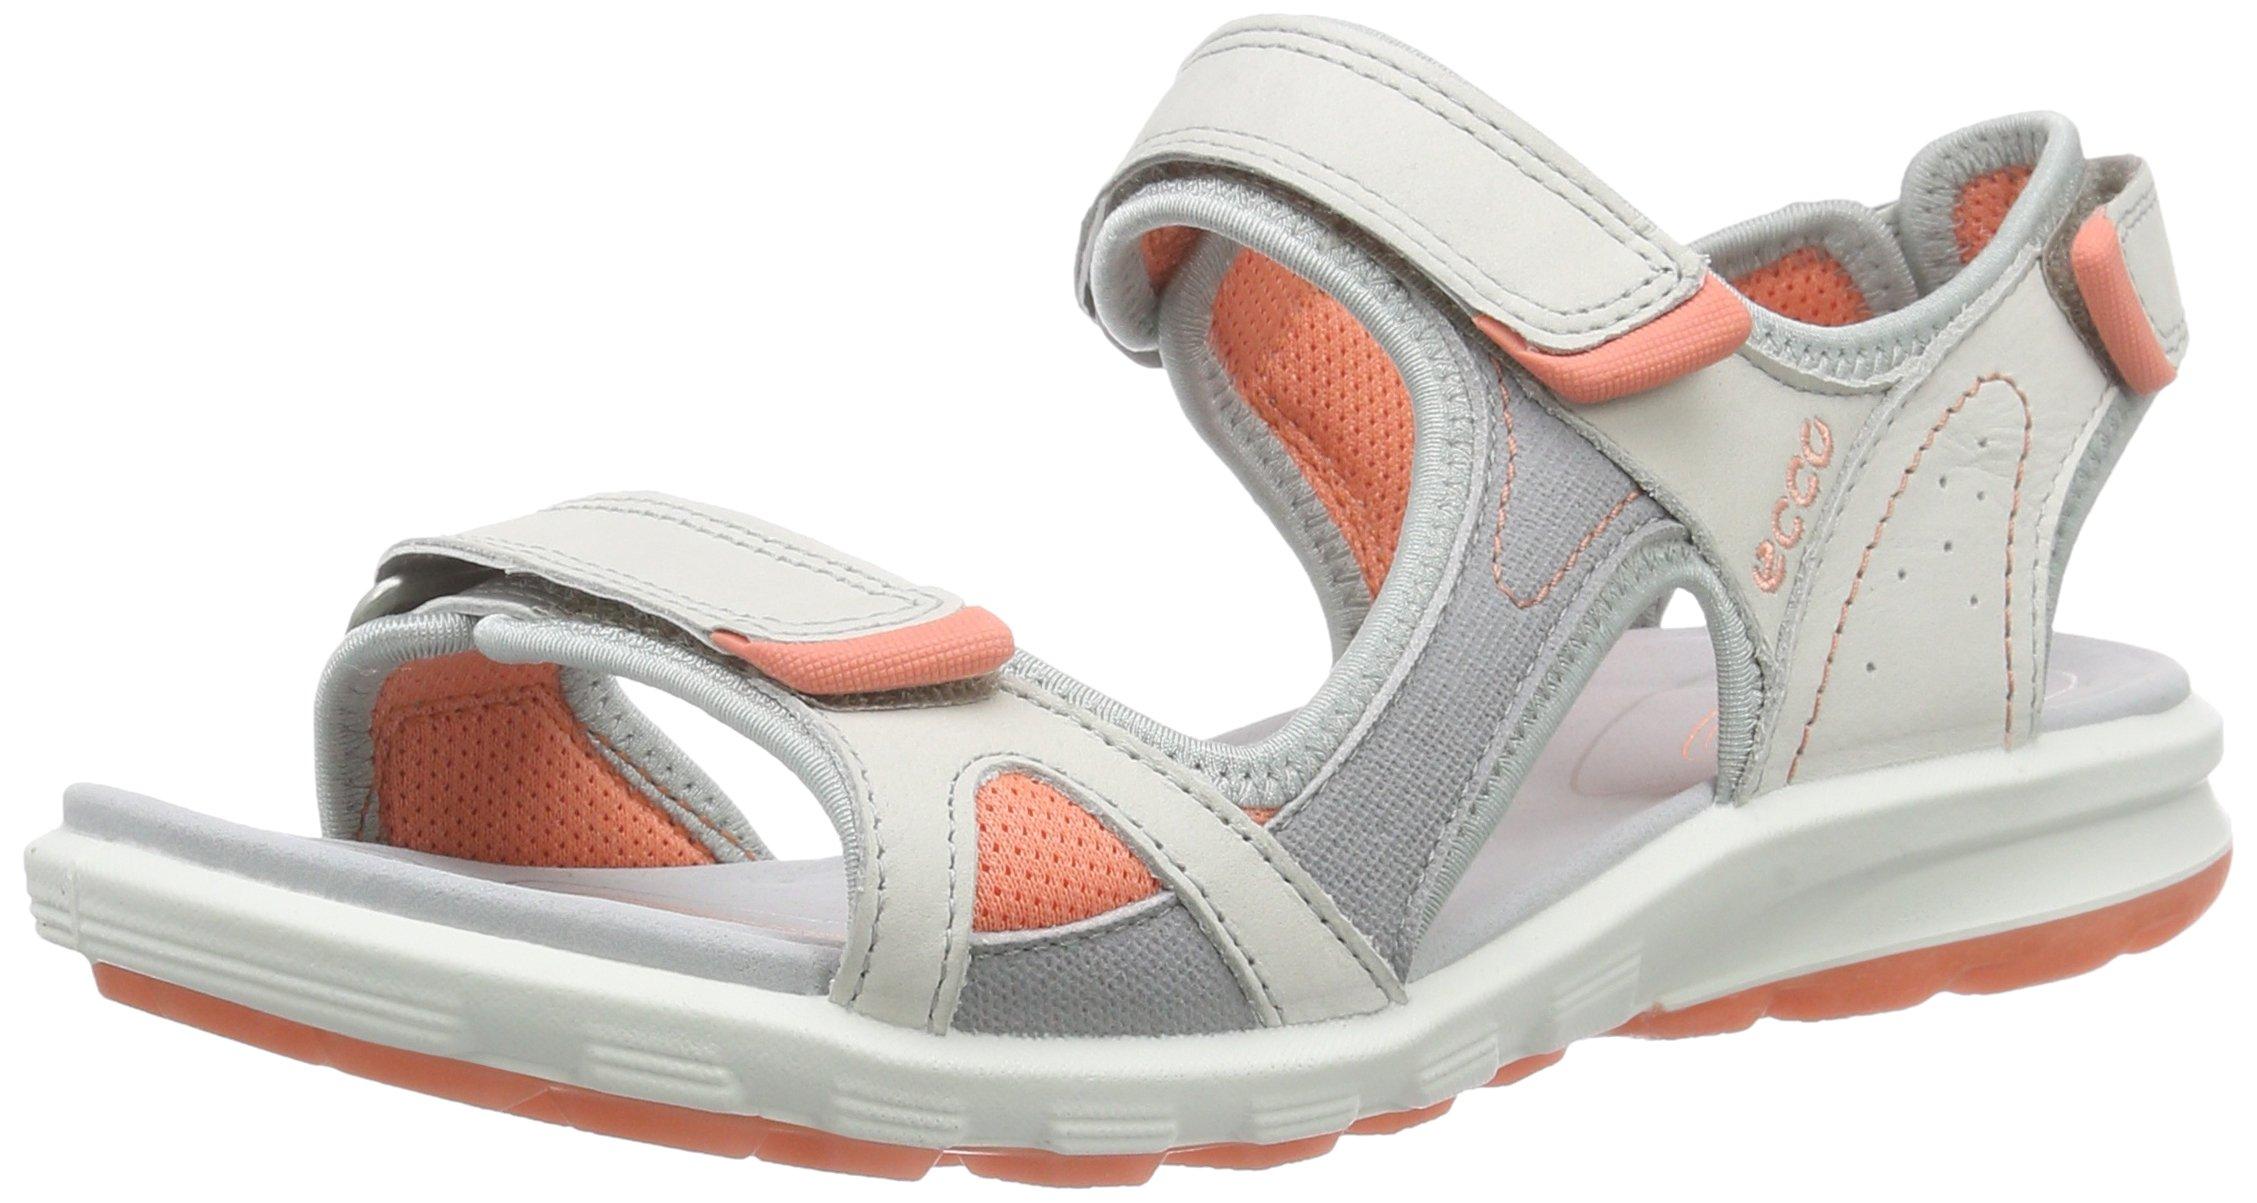 ECCO Women's Women's Cruise Sport Athletic Sandal, Shadow White/Silver Grey/Coral, 40 EU/9-9.5 M US